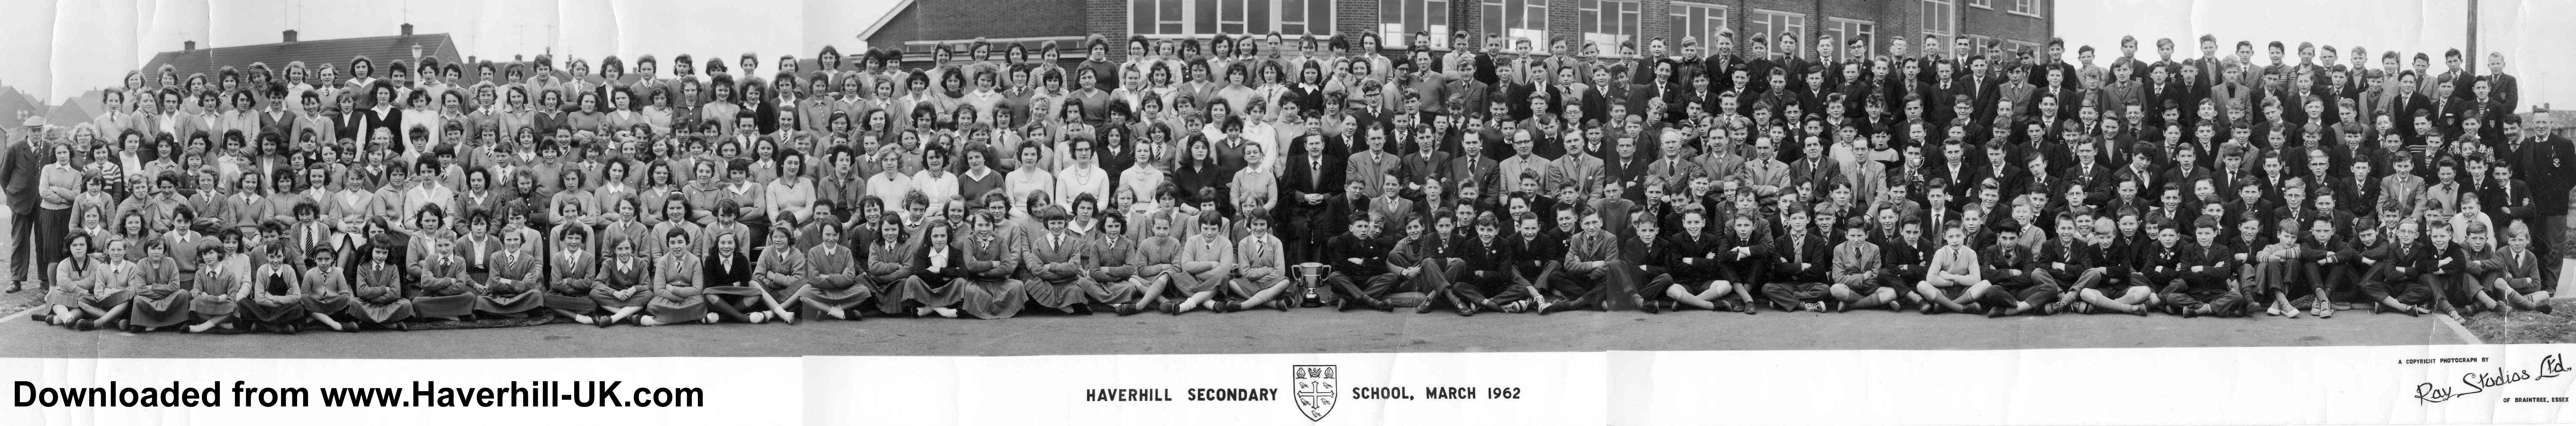 Haverhill-UK - 1962 Haverhill Secondary School Photo ...